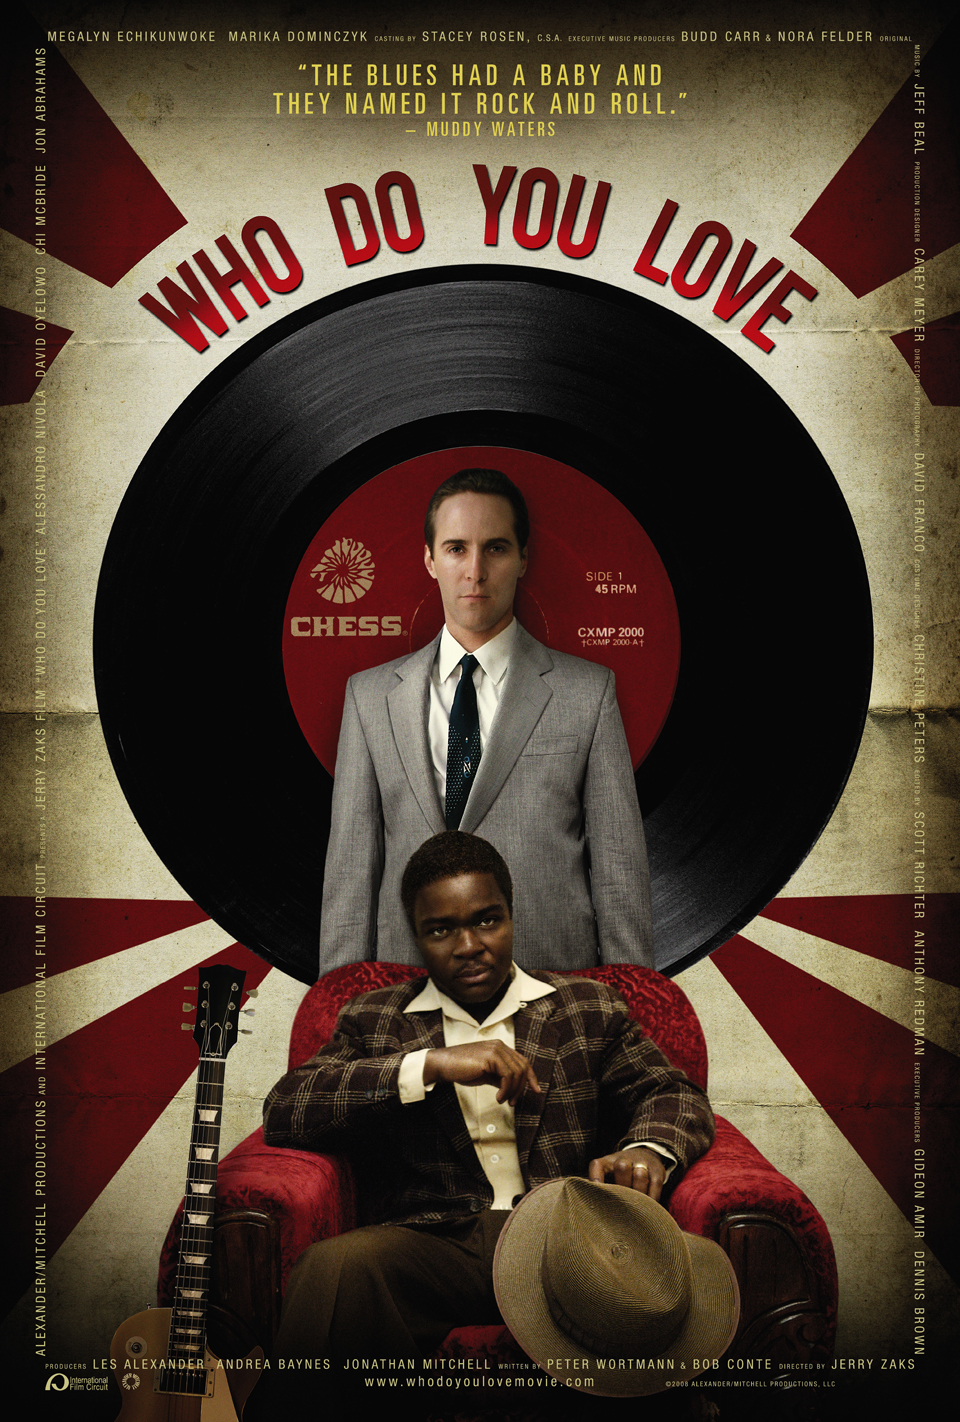 who-do-you-love-movie-poster-1.jpg